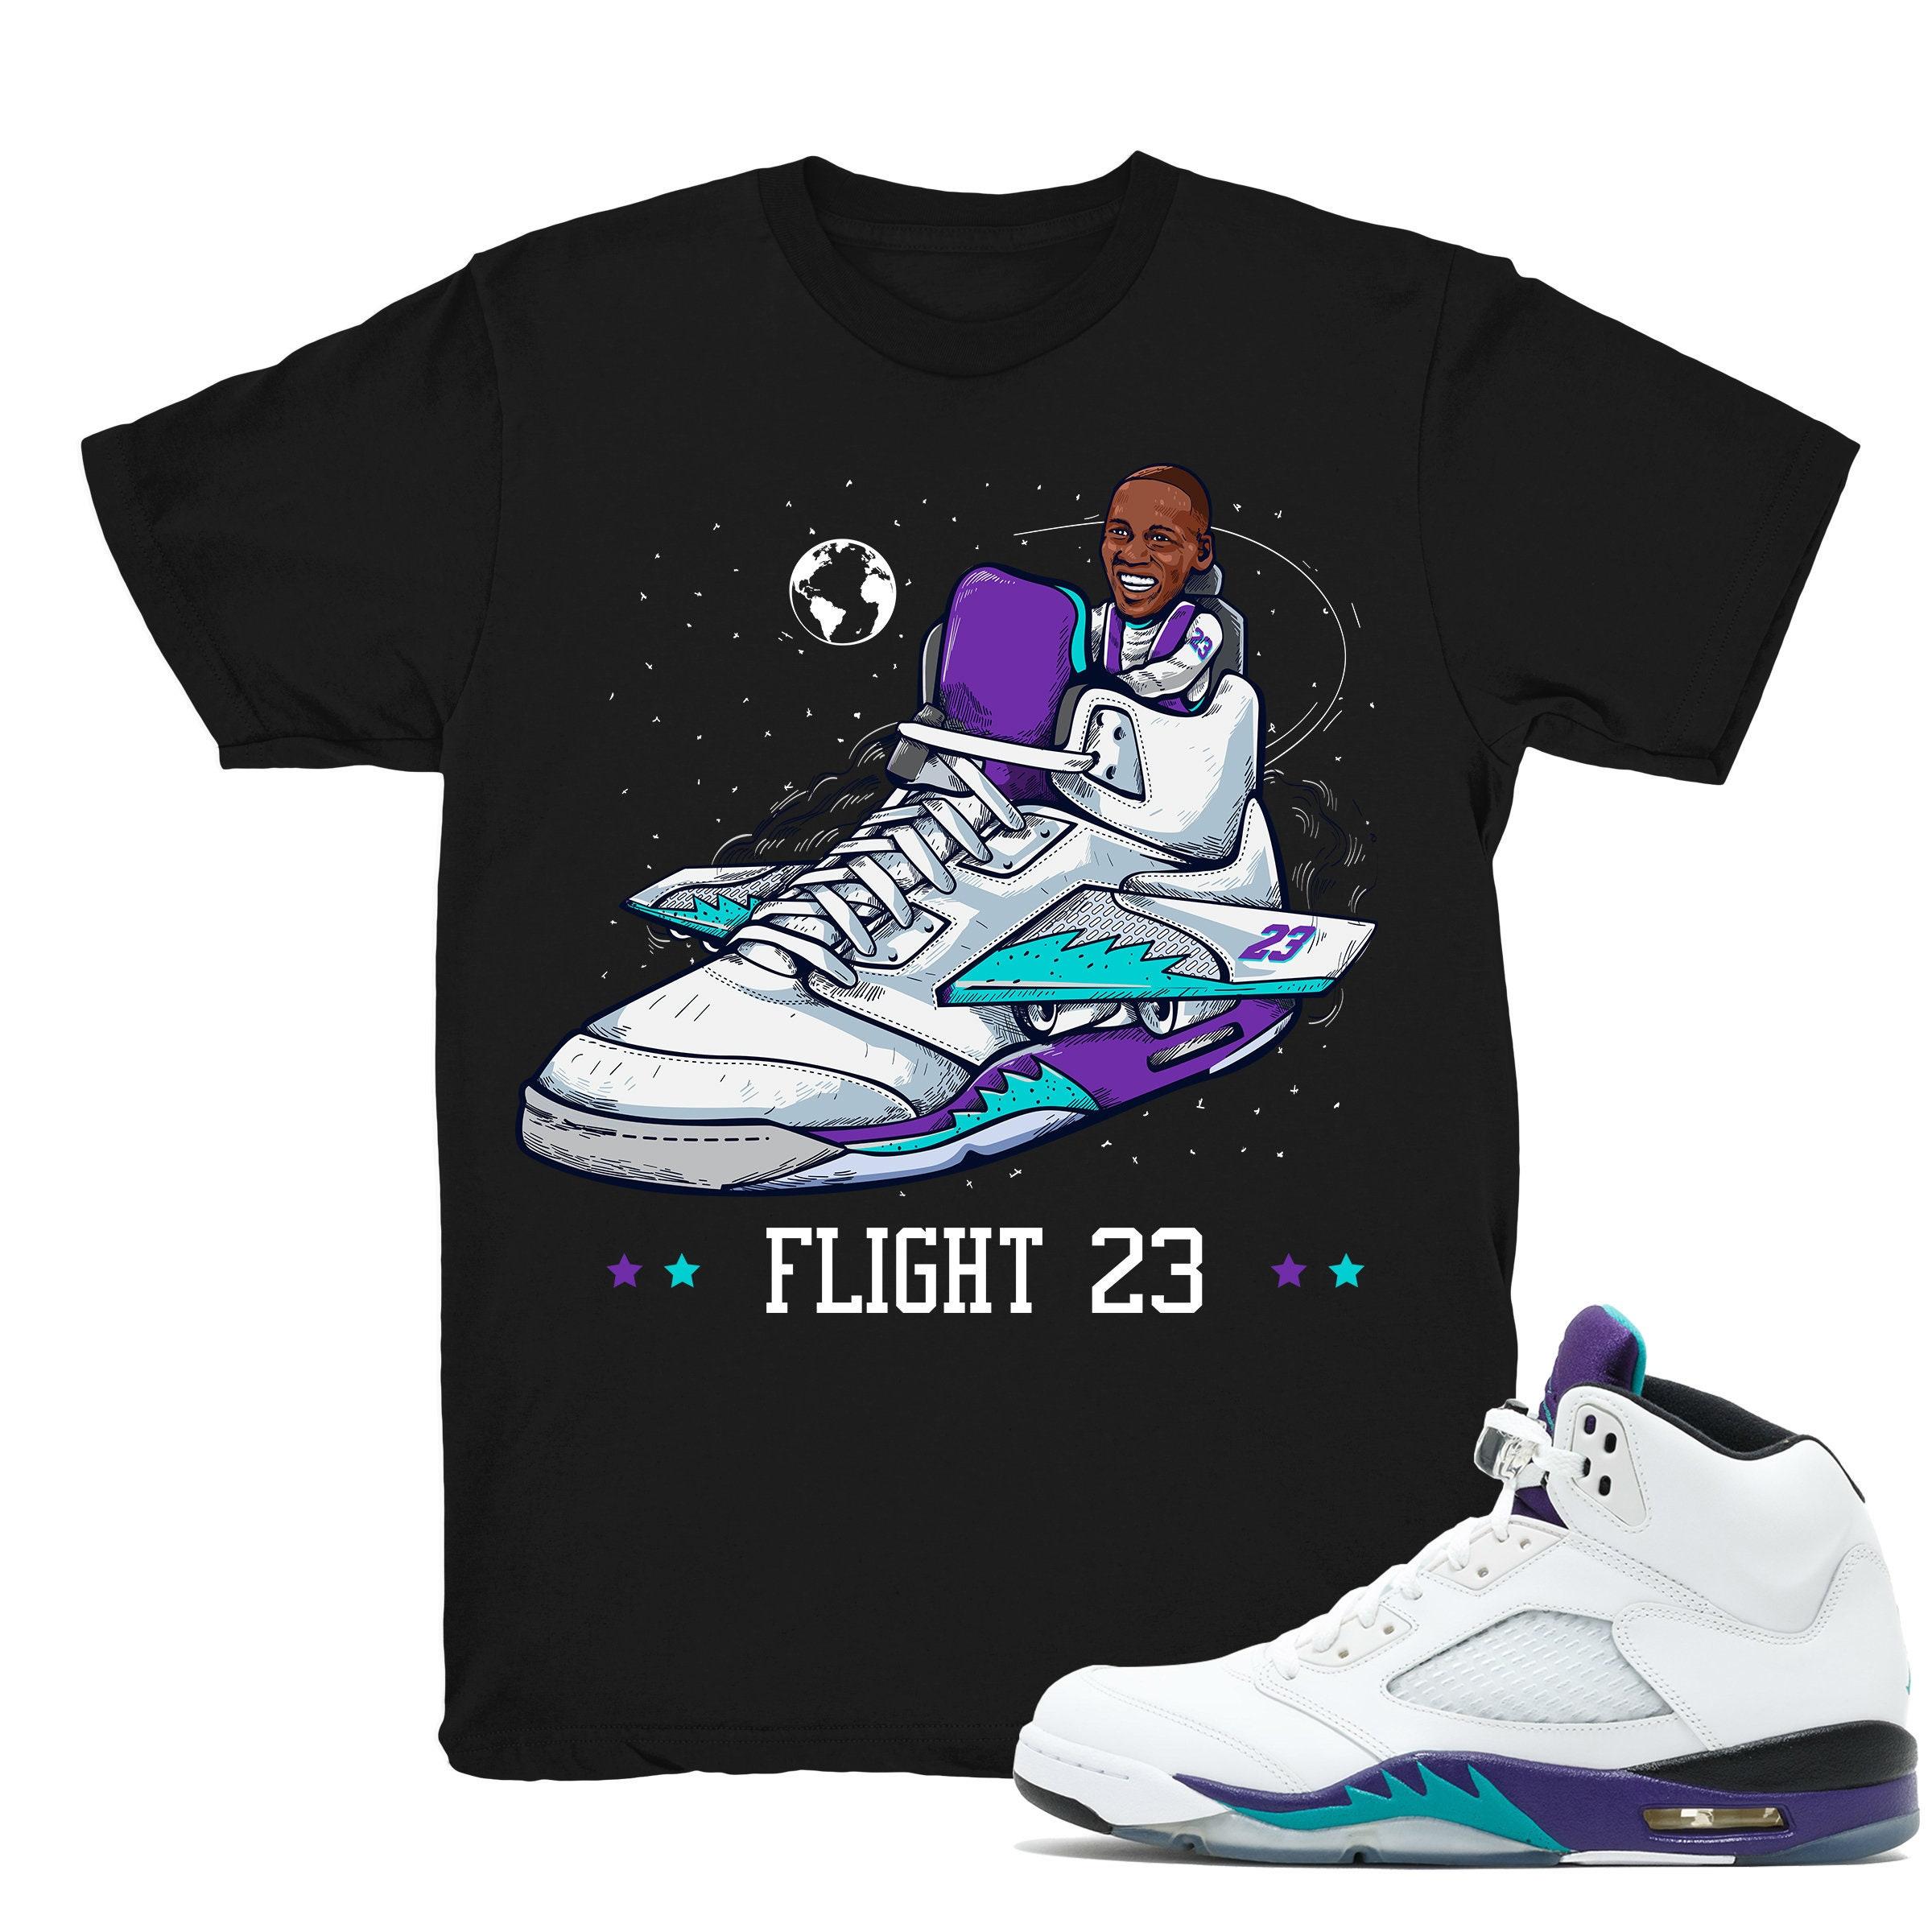 official photos 79f3d bac9b Air Jordan 5 Grape shirt | Flight 23 - Retro 5 Fresh Prince Grape Black tee  shirts